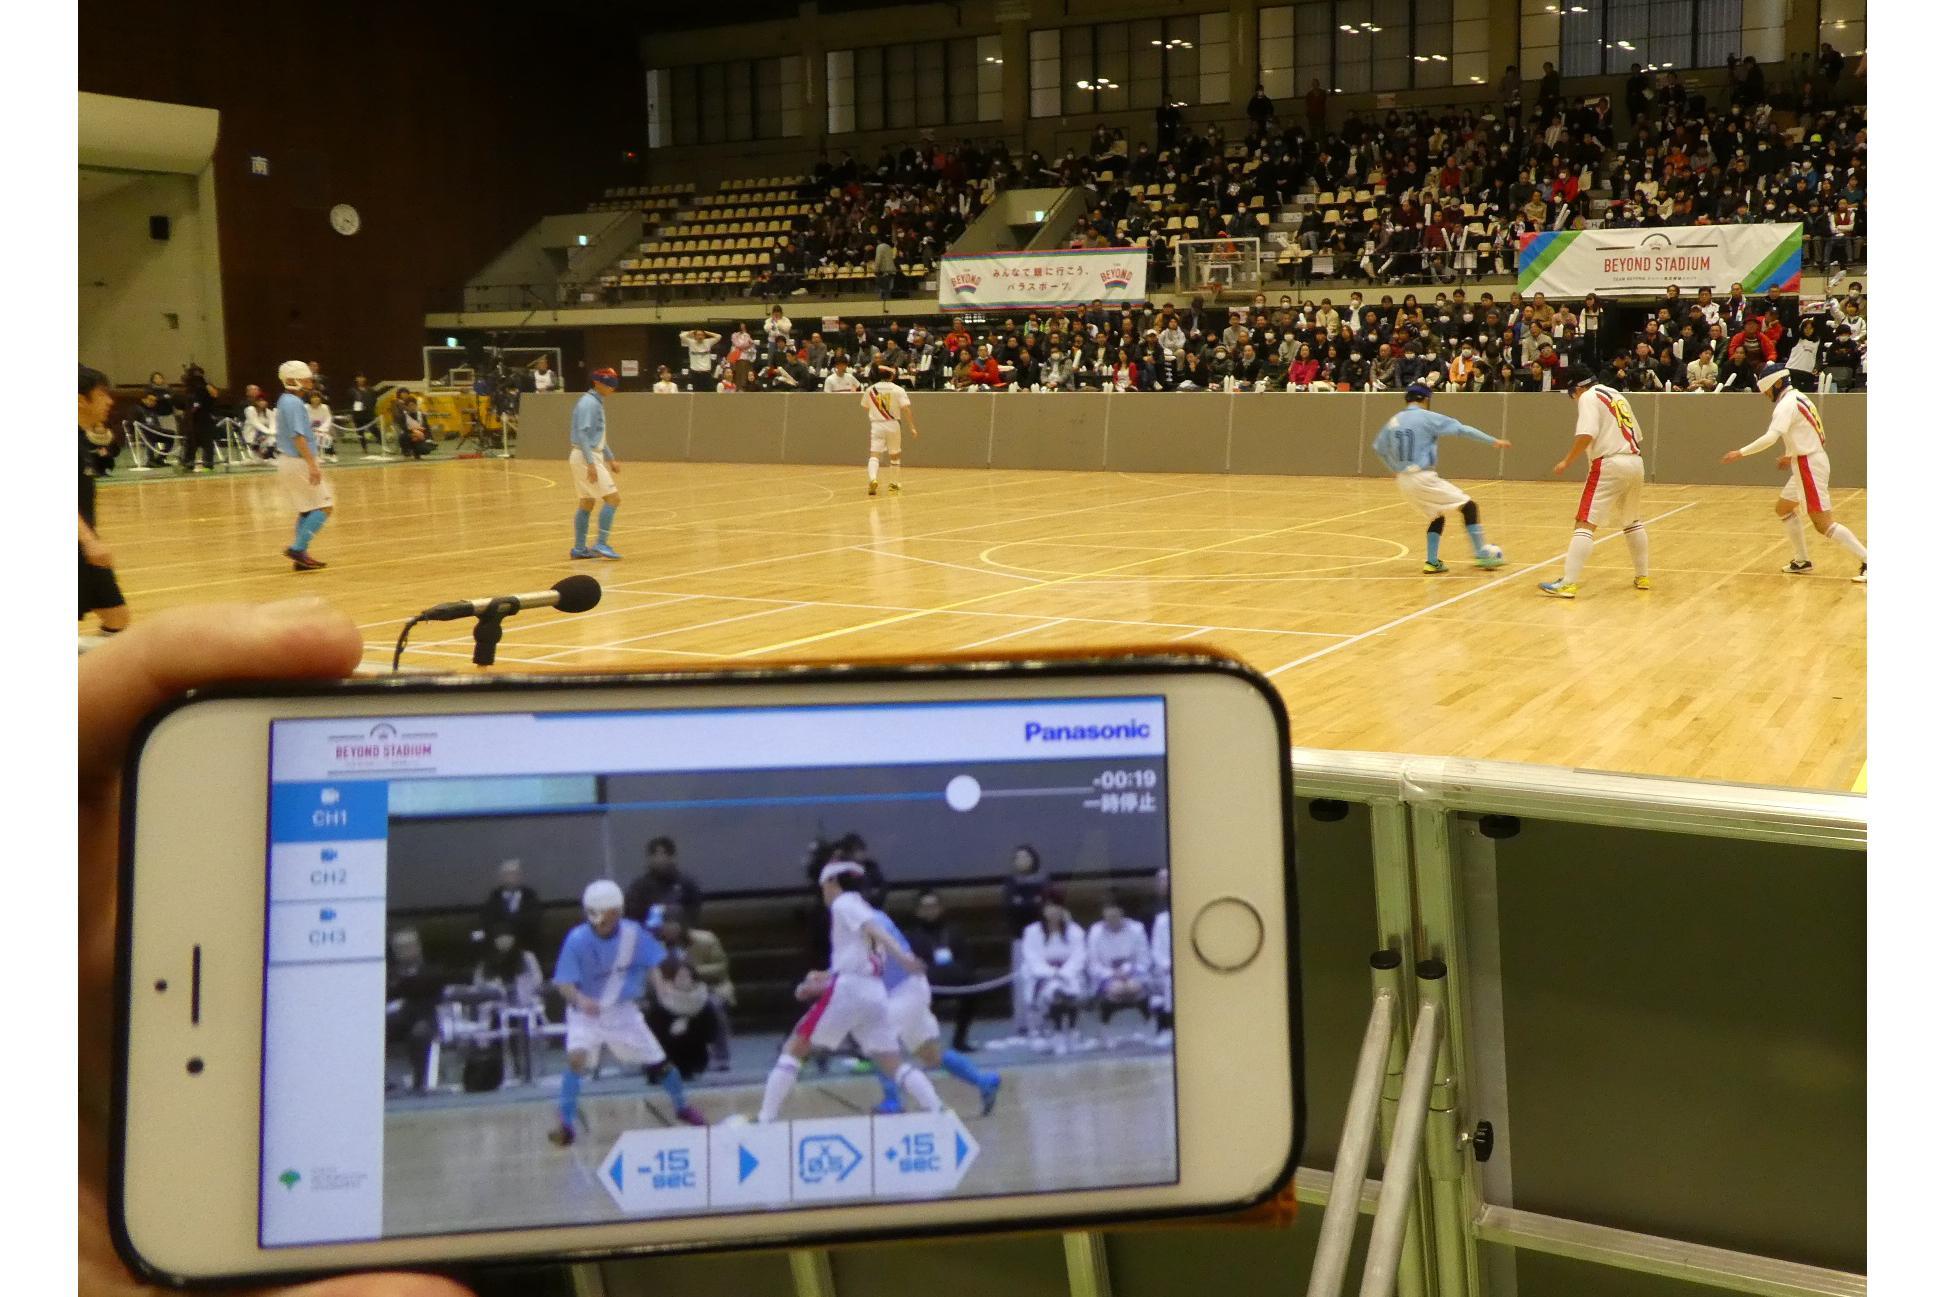 photo: People watching blind football using Panasonic's multi-video streaming service